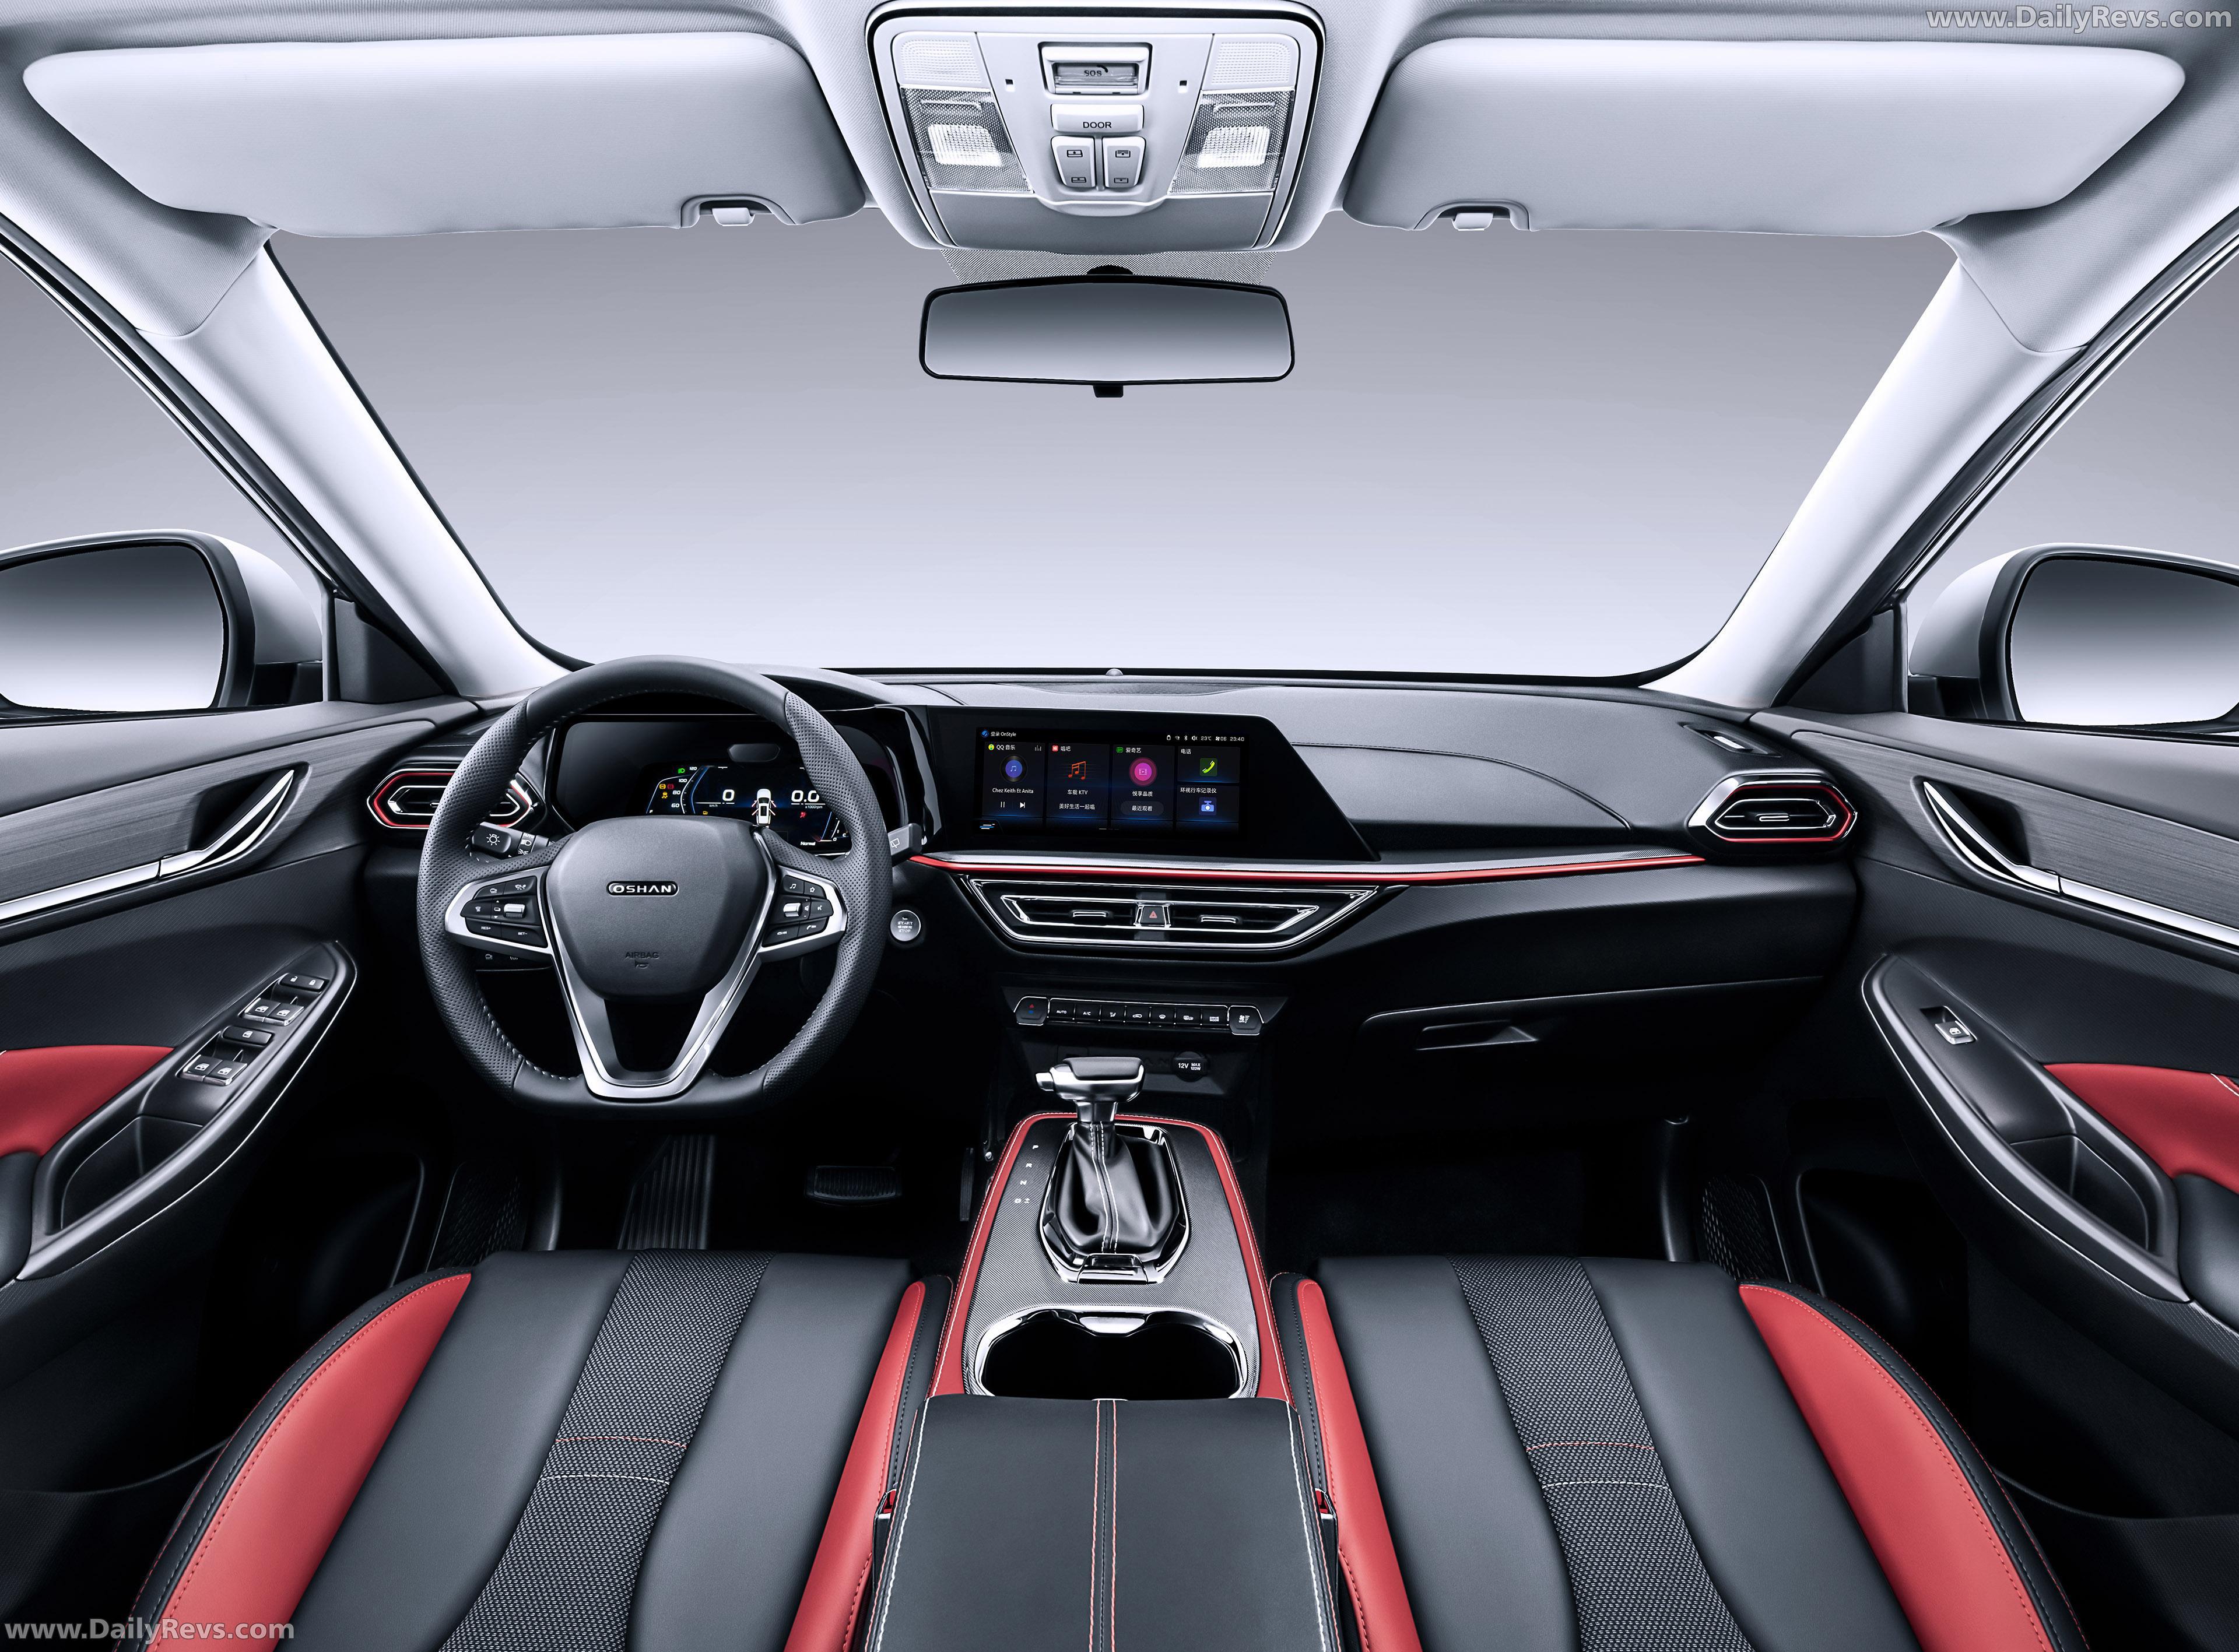 2020 Changan Auto Oshan X5 full